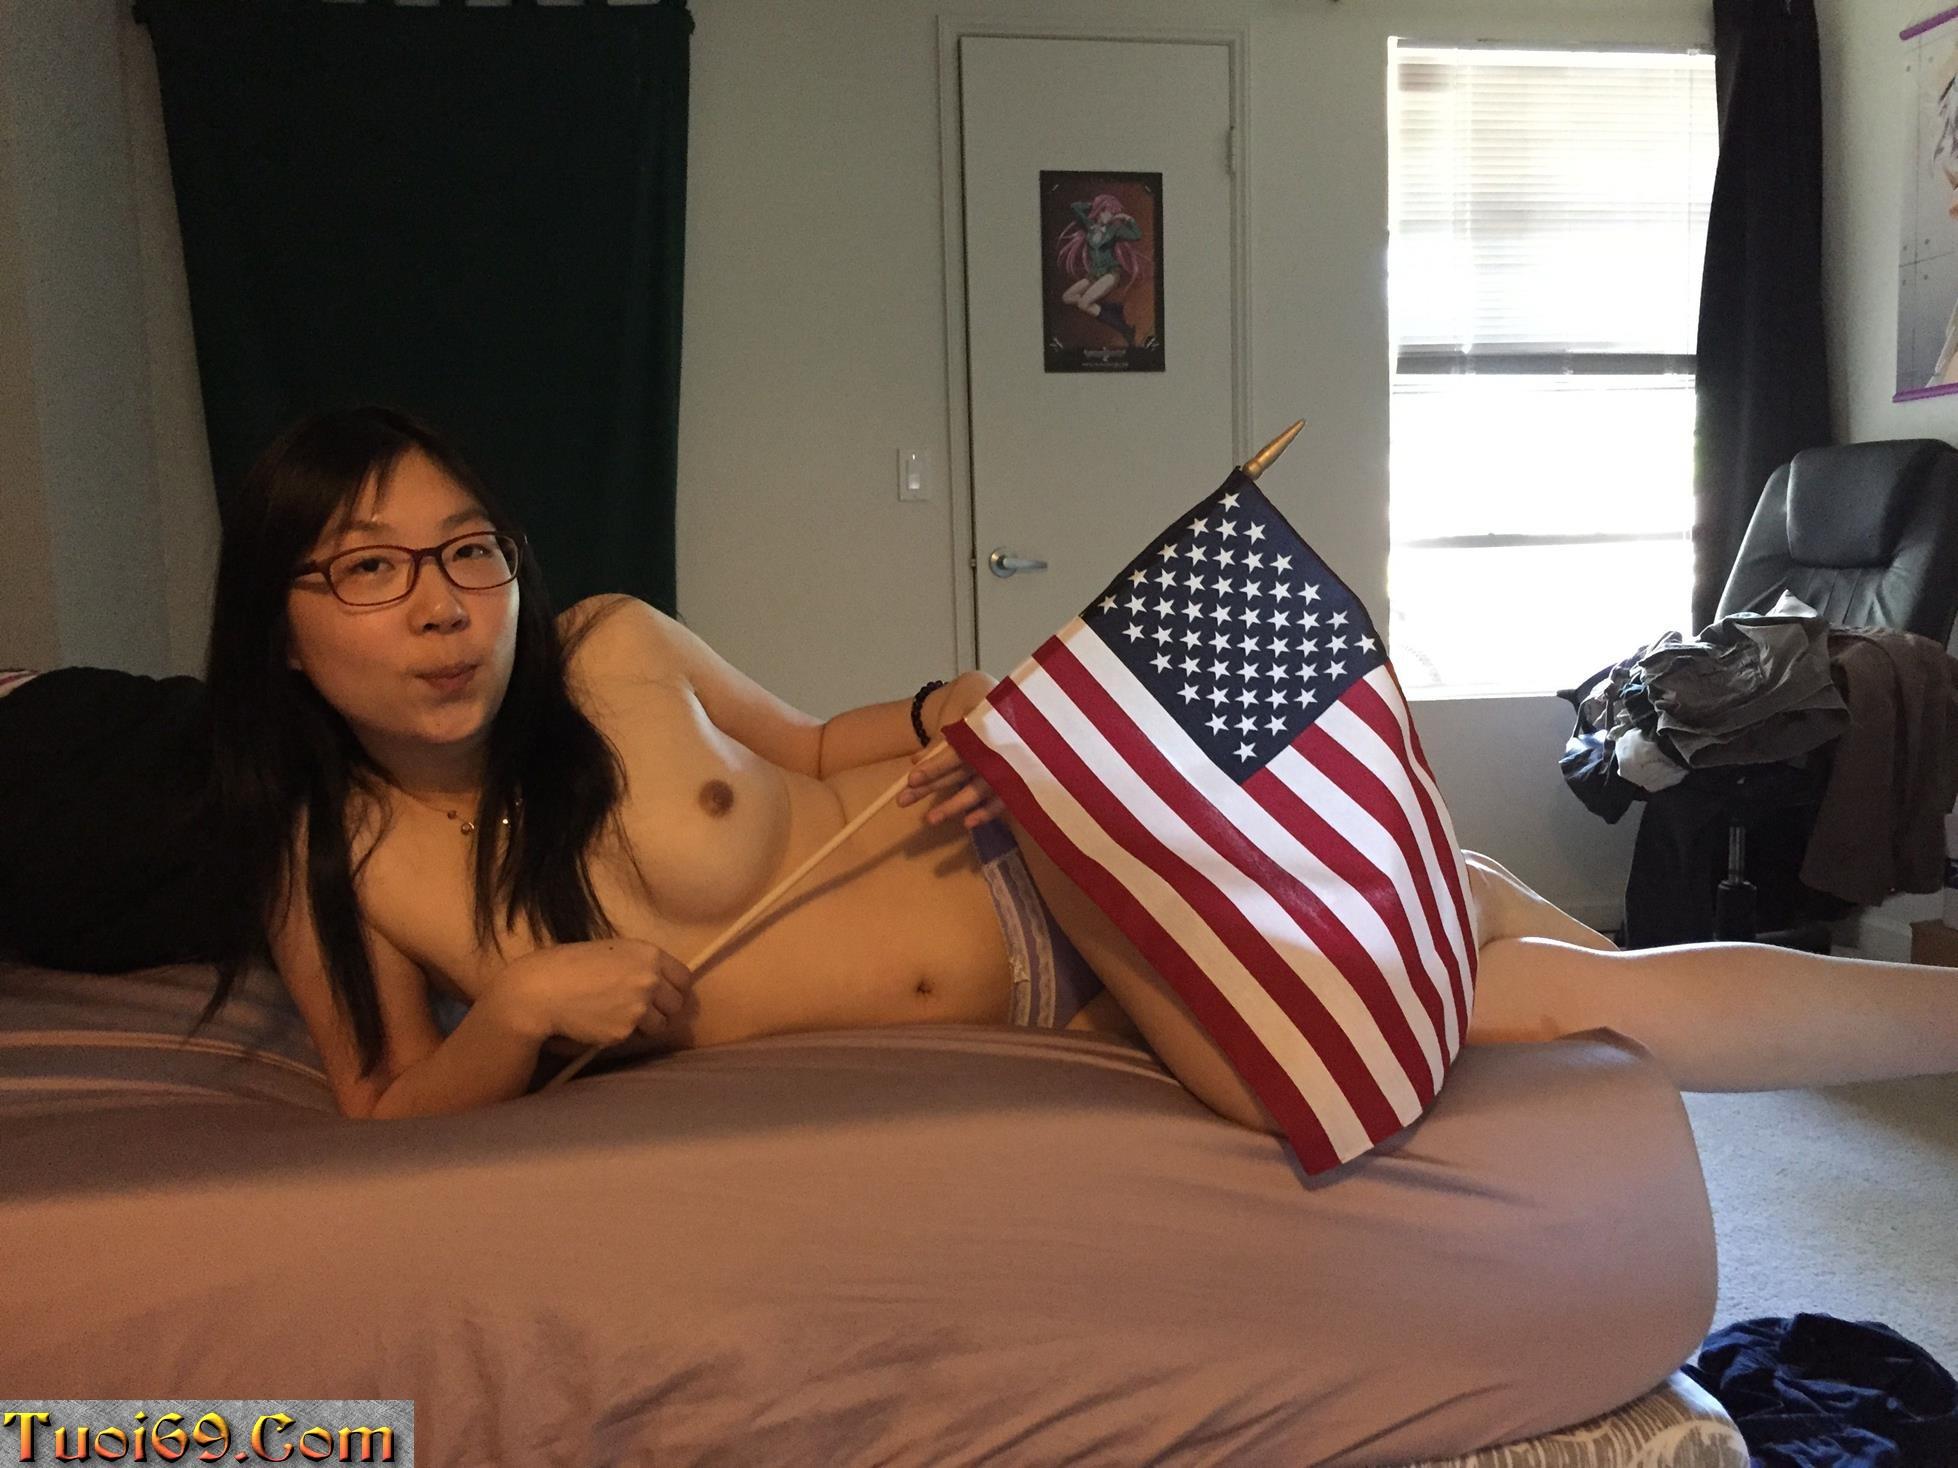 Cute-Korean-Carmen-nice-boobs-wet-pussy-masturbate-and-sex-photos-leaked-14-Copy